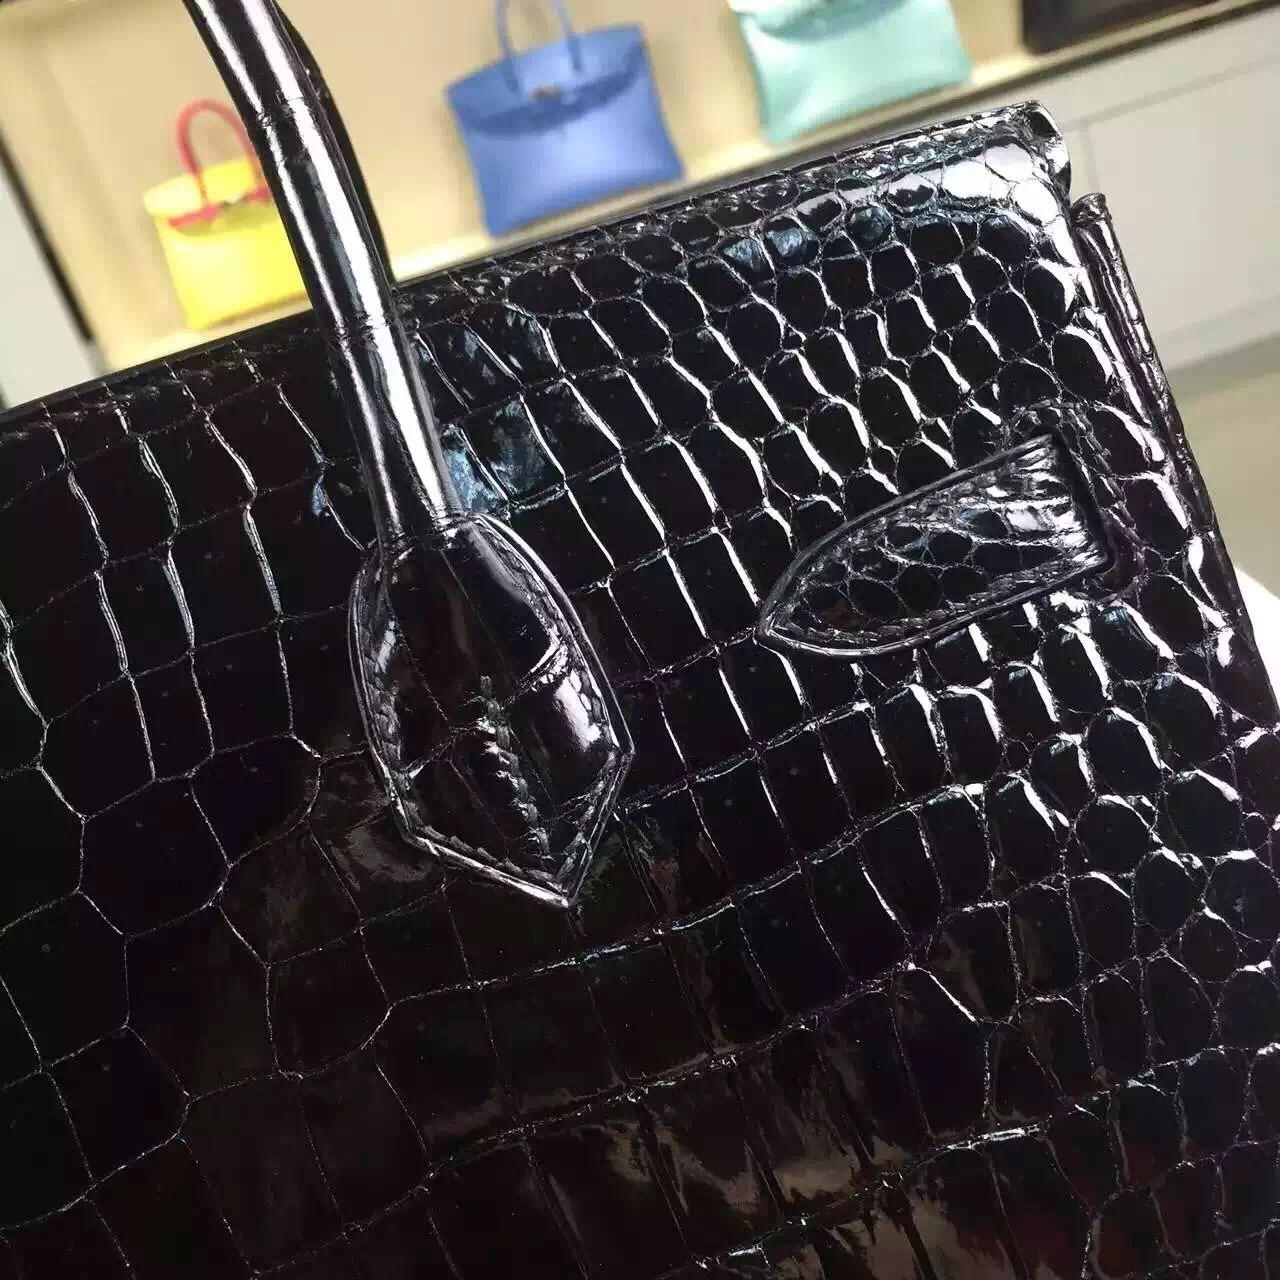 High Quality Hermes France Original Crocodile Skin Birkin30 in Black Gold Hardware